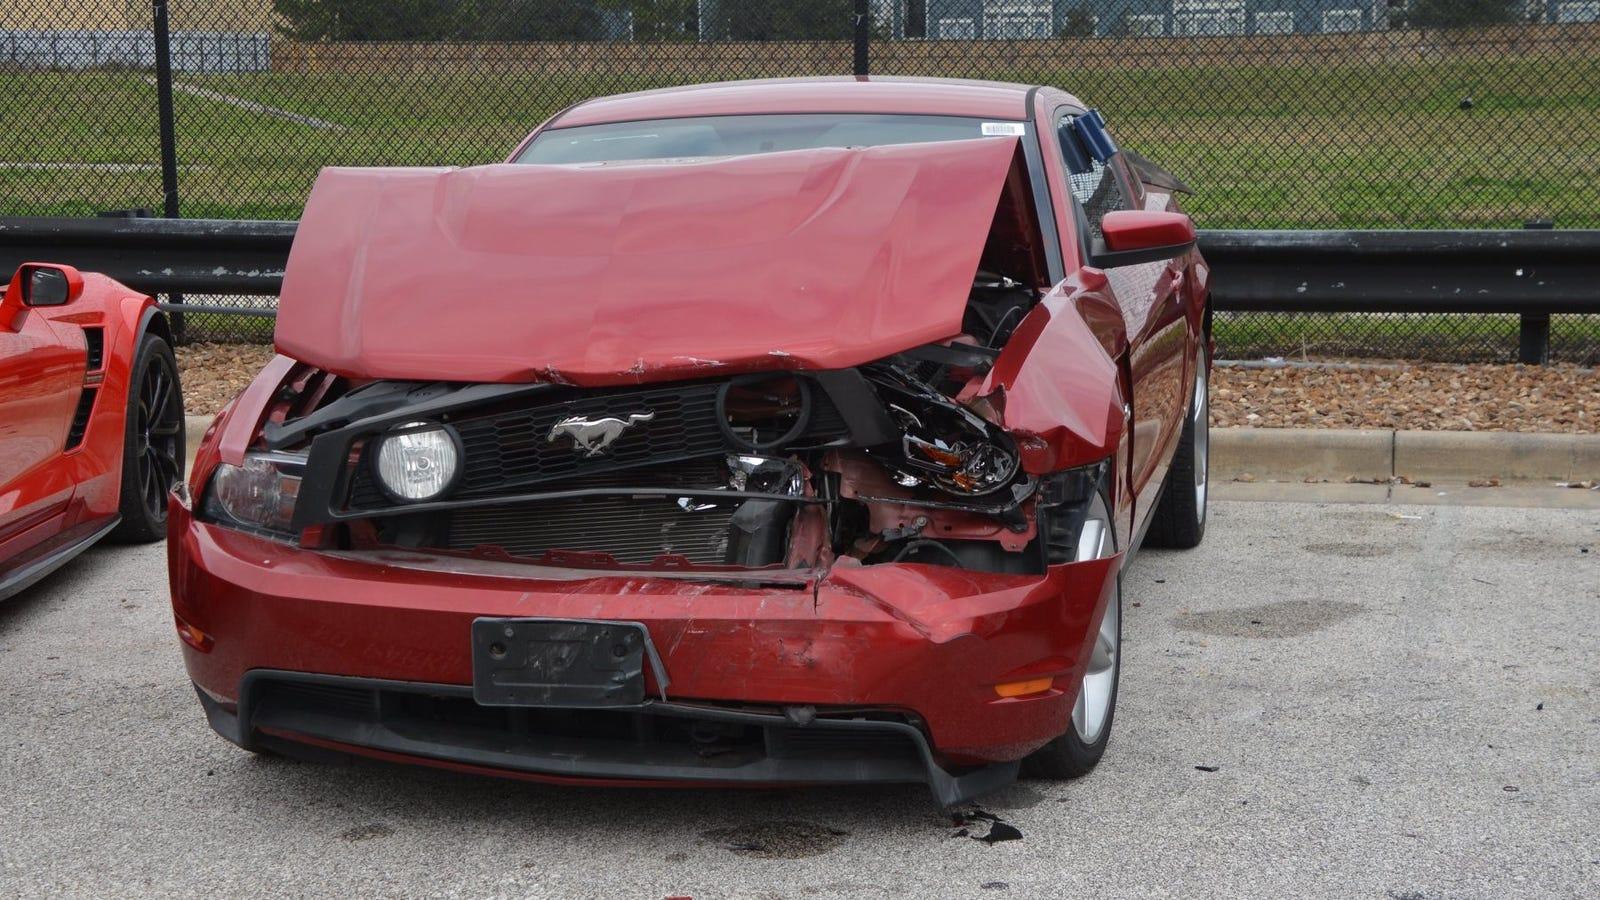 Does Carmax Buy Cars: Four Kids Break Into Houston Carmax, Crash $800,000 Worth